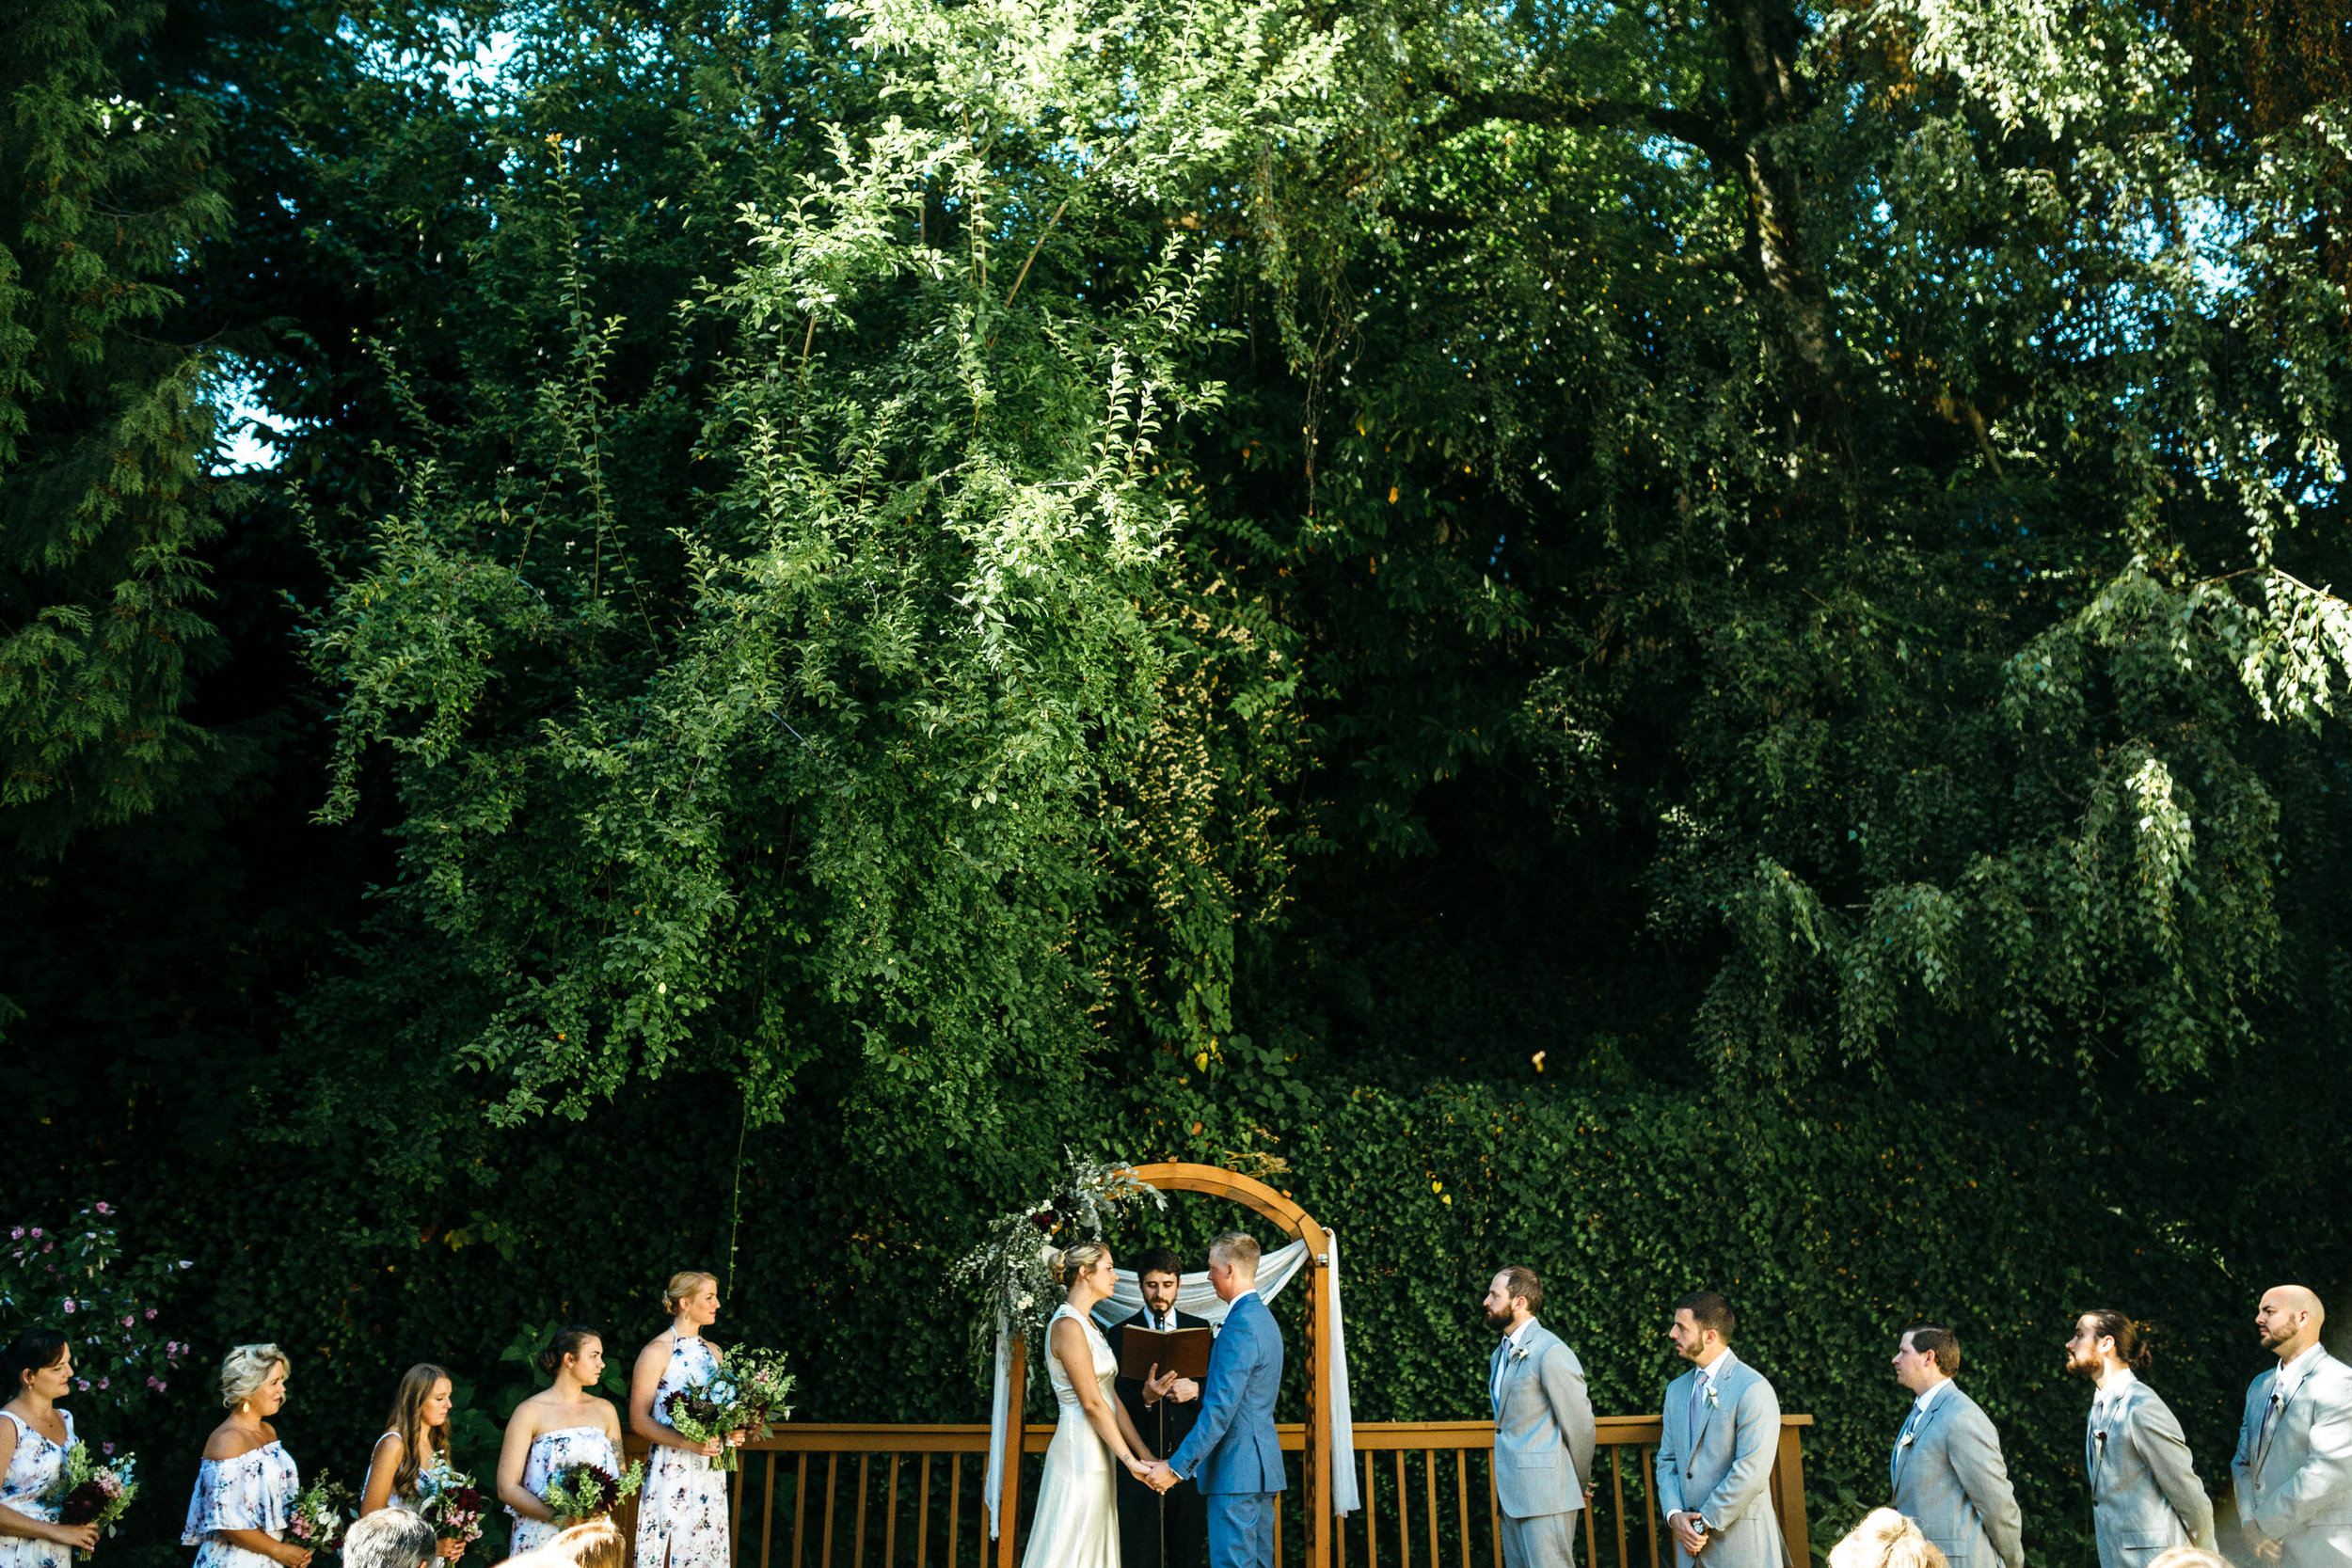 Laurelhurst Park club wedding photographer Portand pdx Oregon059.JPG